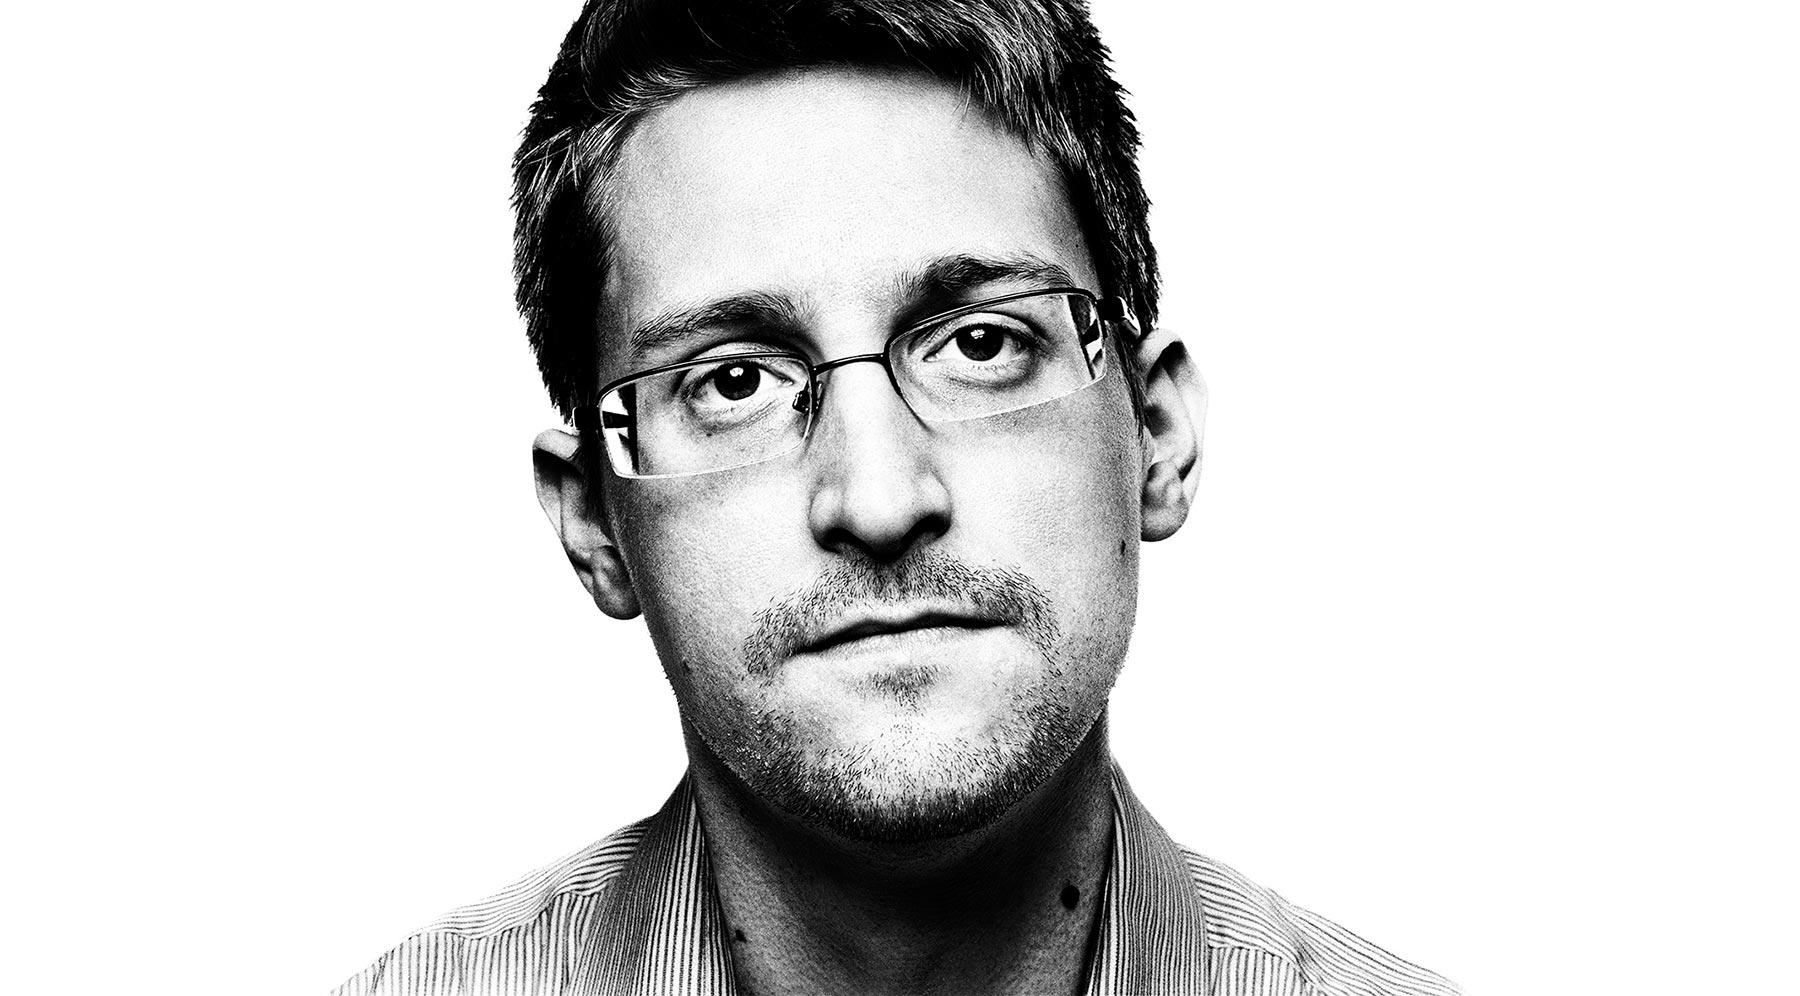 Edward Snowden, Chelsea Manning, whistleblowers, NSA spying, Eric Holder, Espionage Act, Thomas Drake